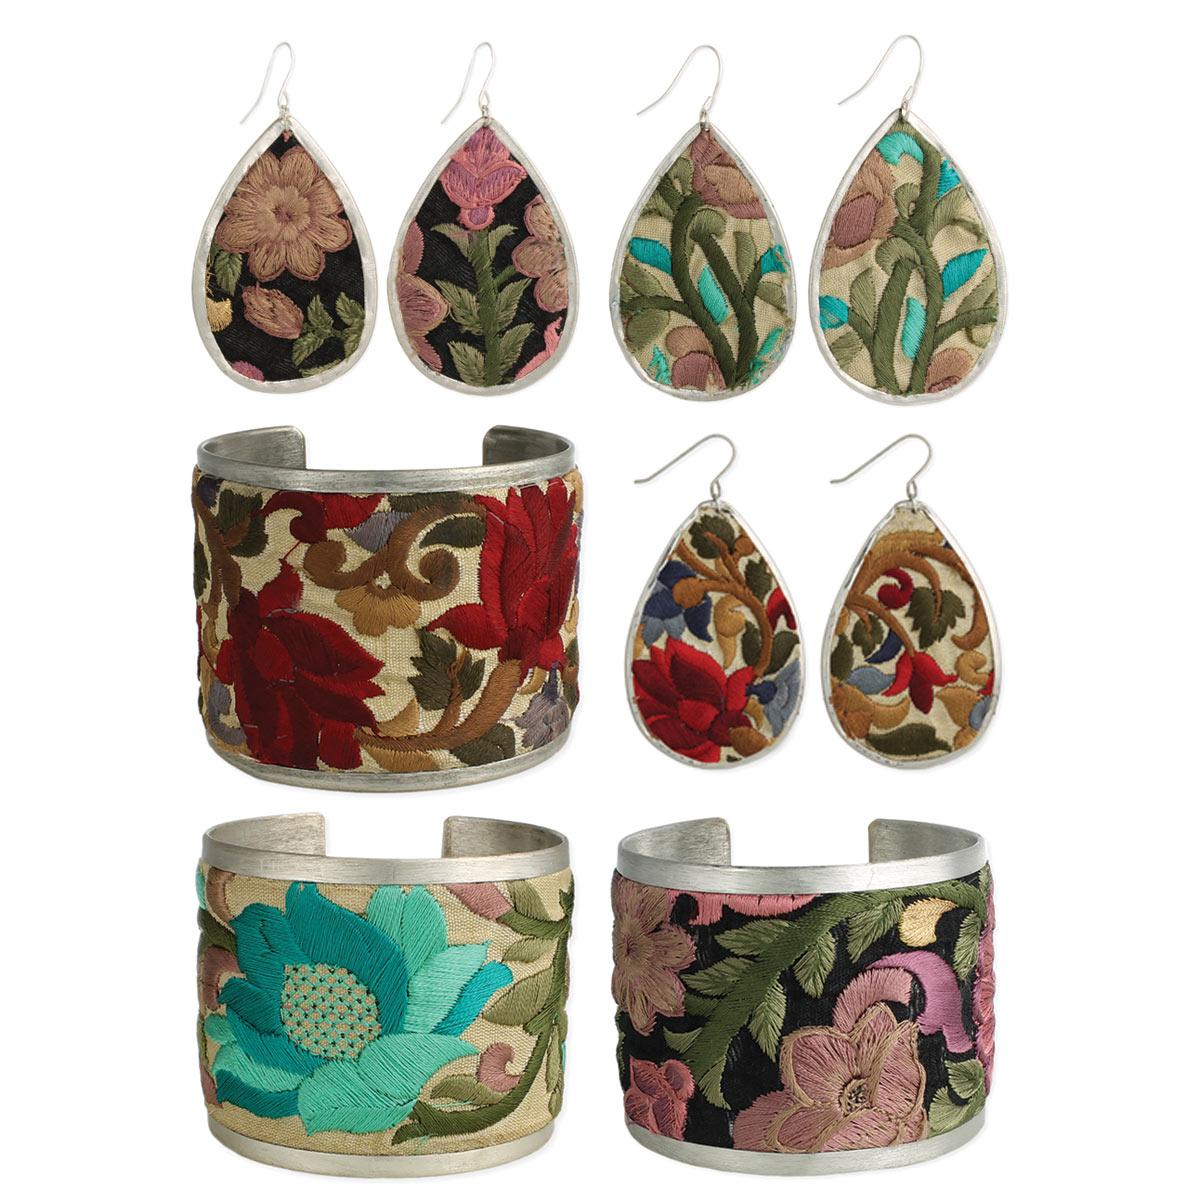 Embroidred Earring & Cuff Bracelet Set